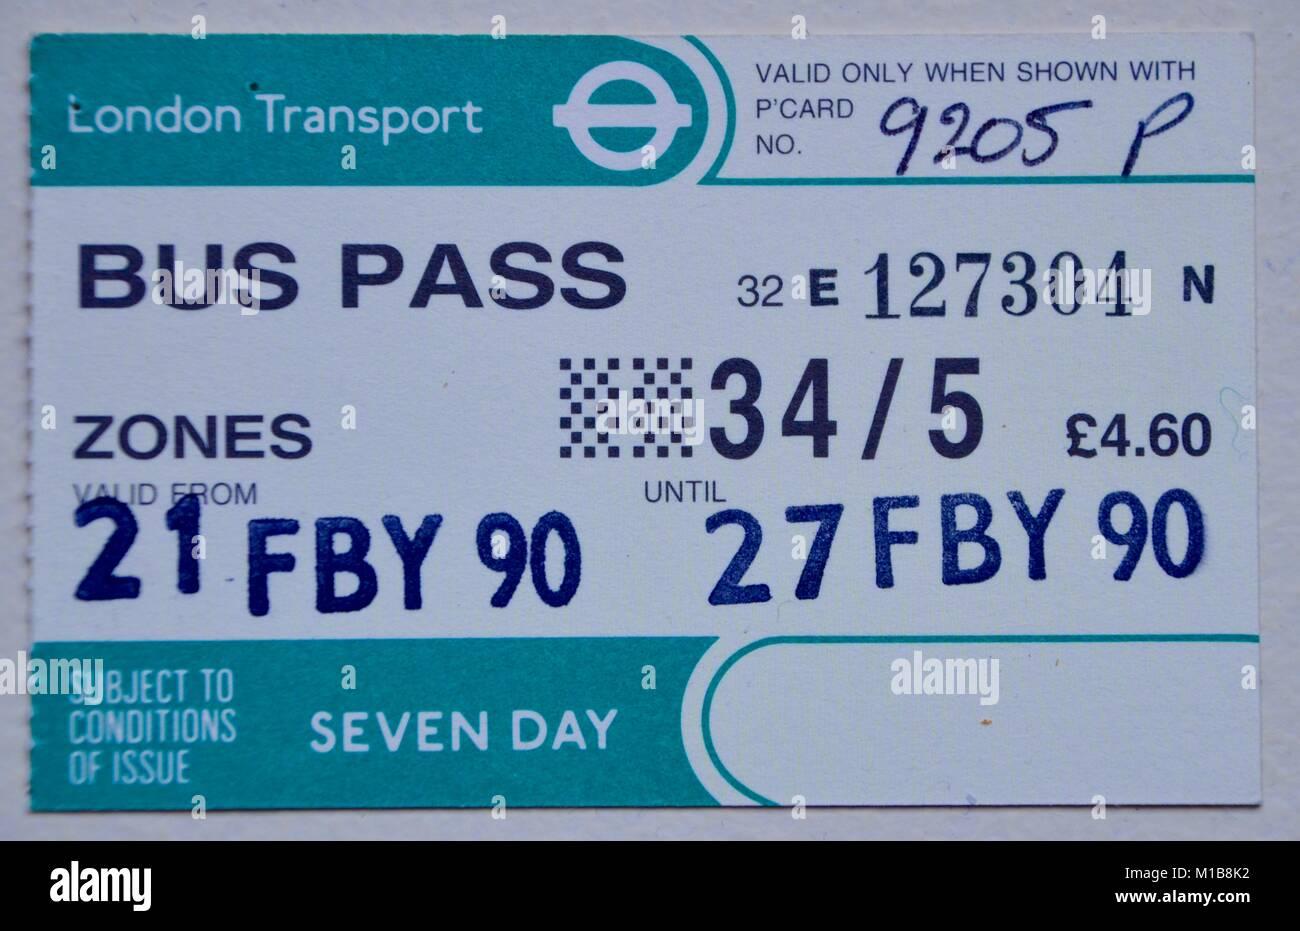 london transport bus pass weekly circa 1990 - Stock Image